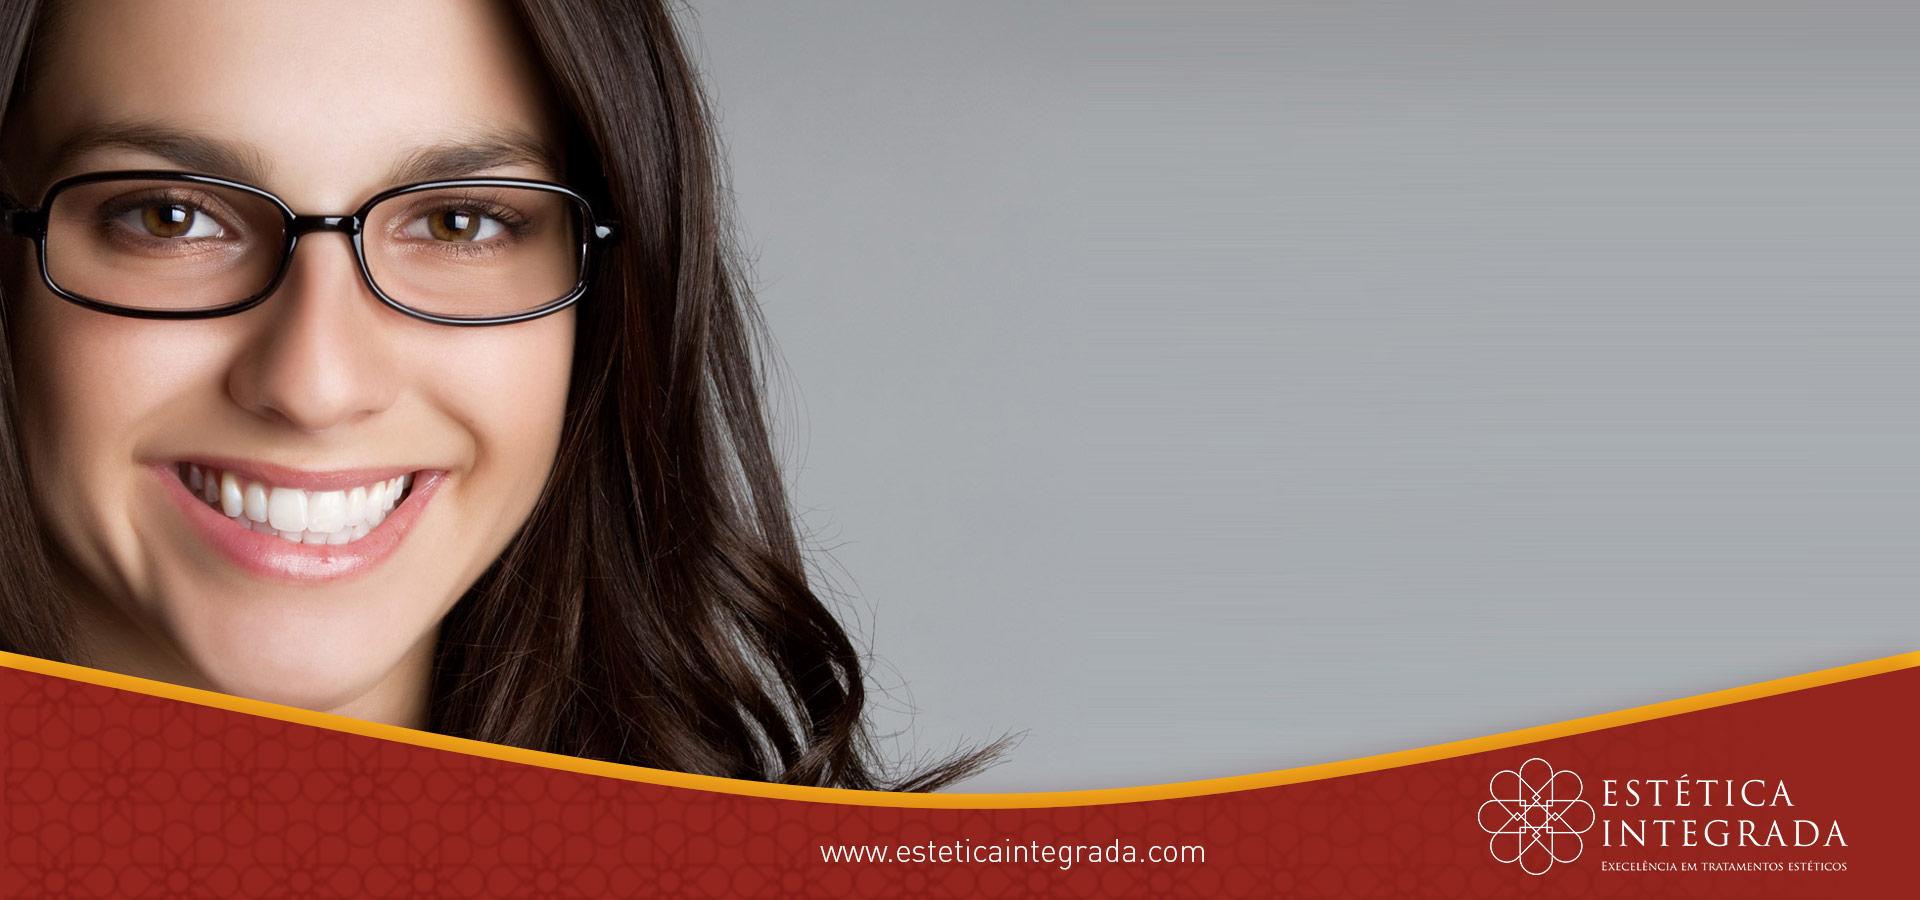 clareamento-odontologico-estetica-integrada-brasilia